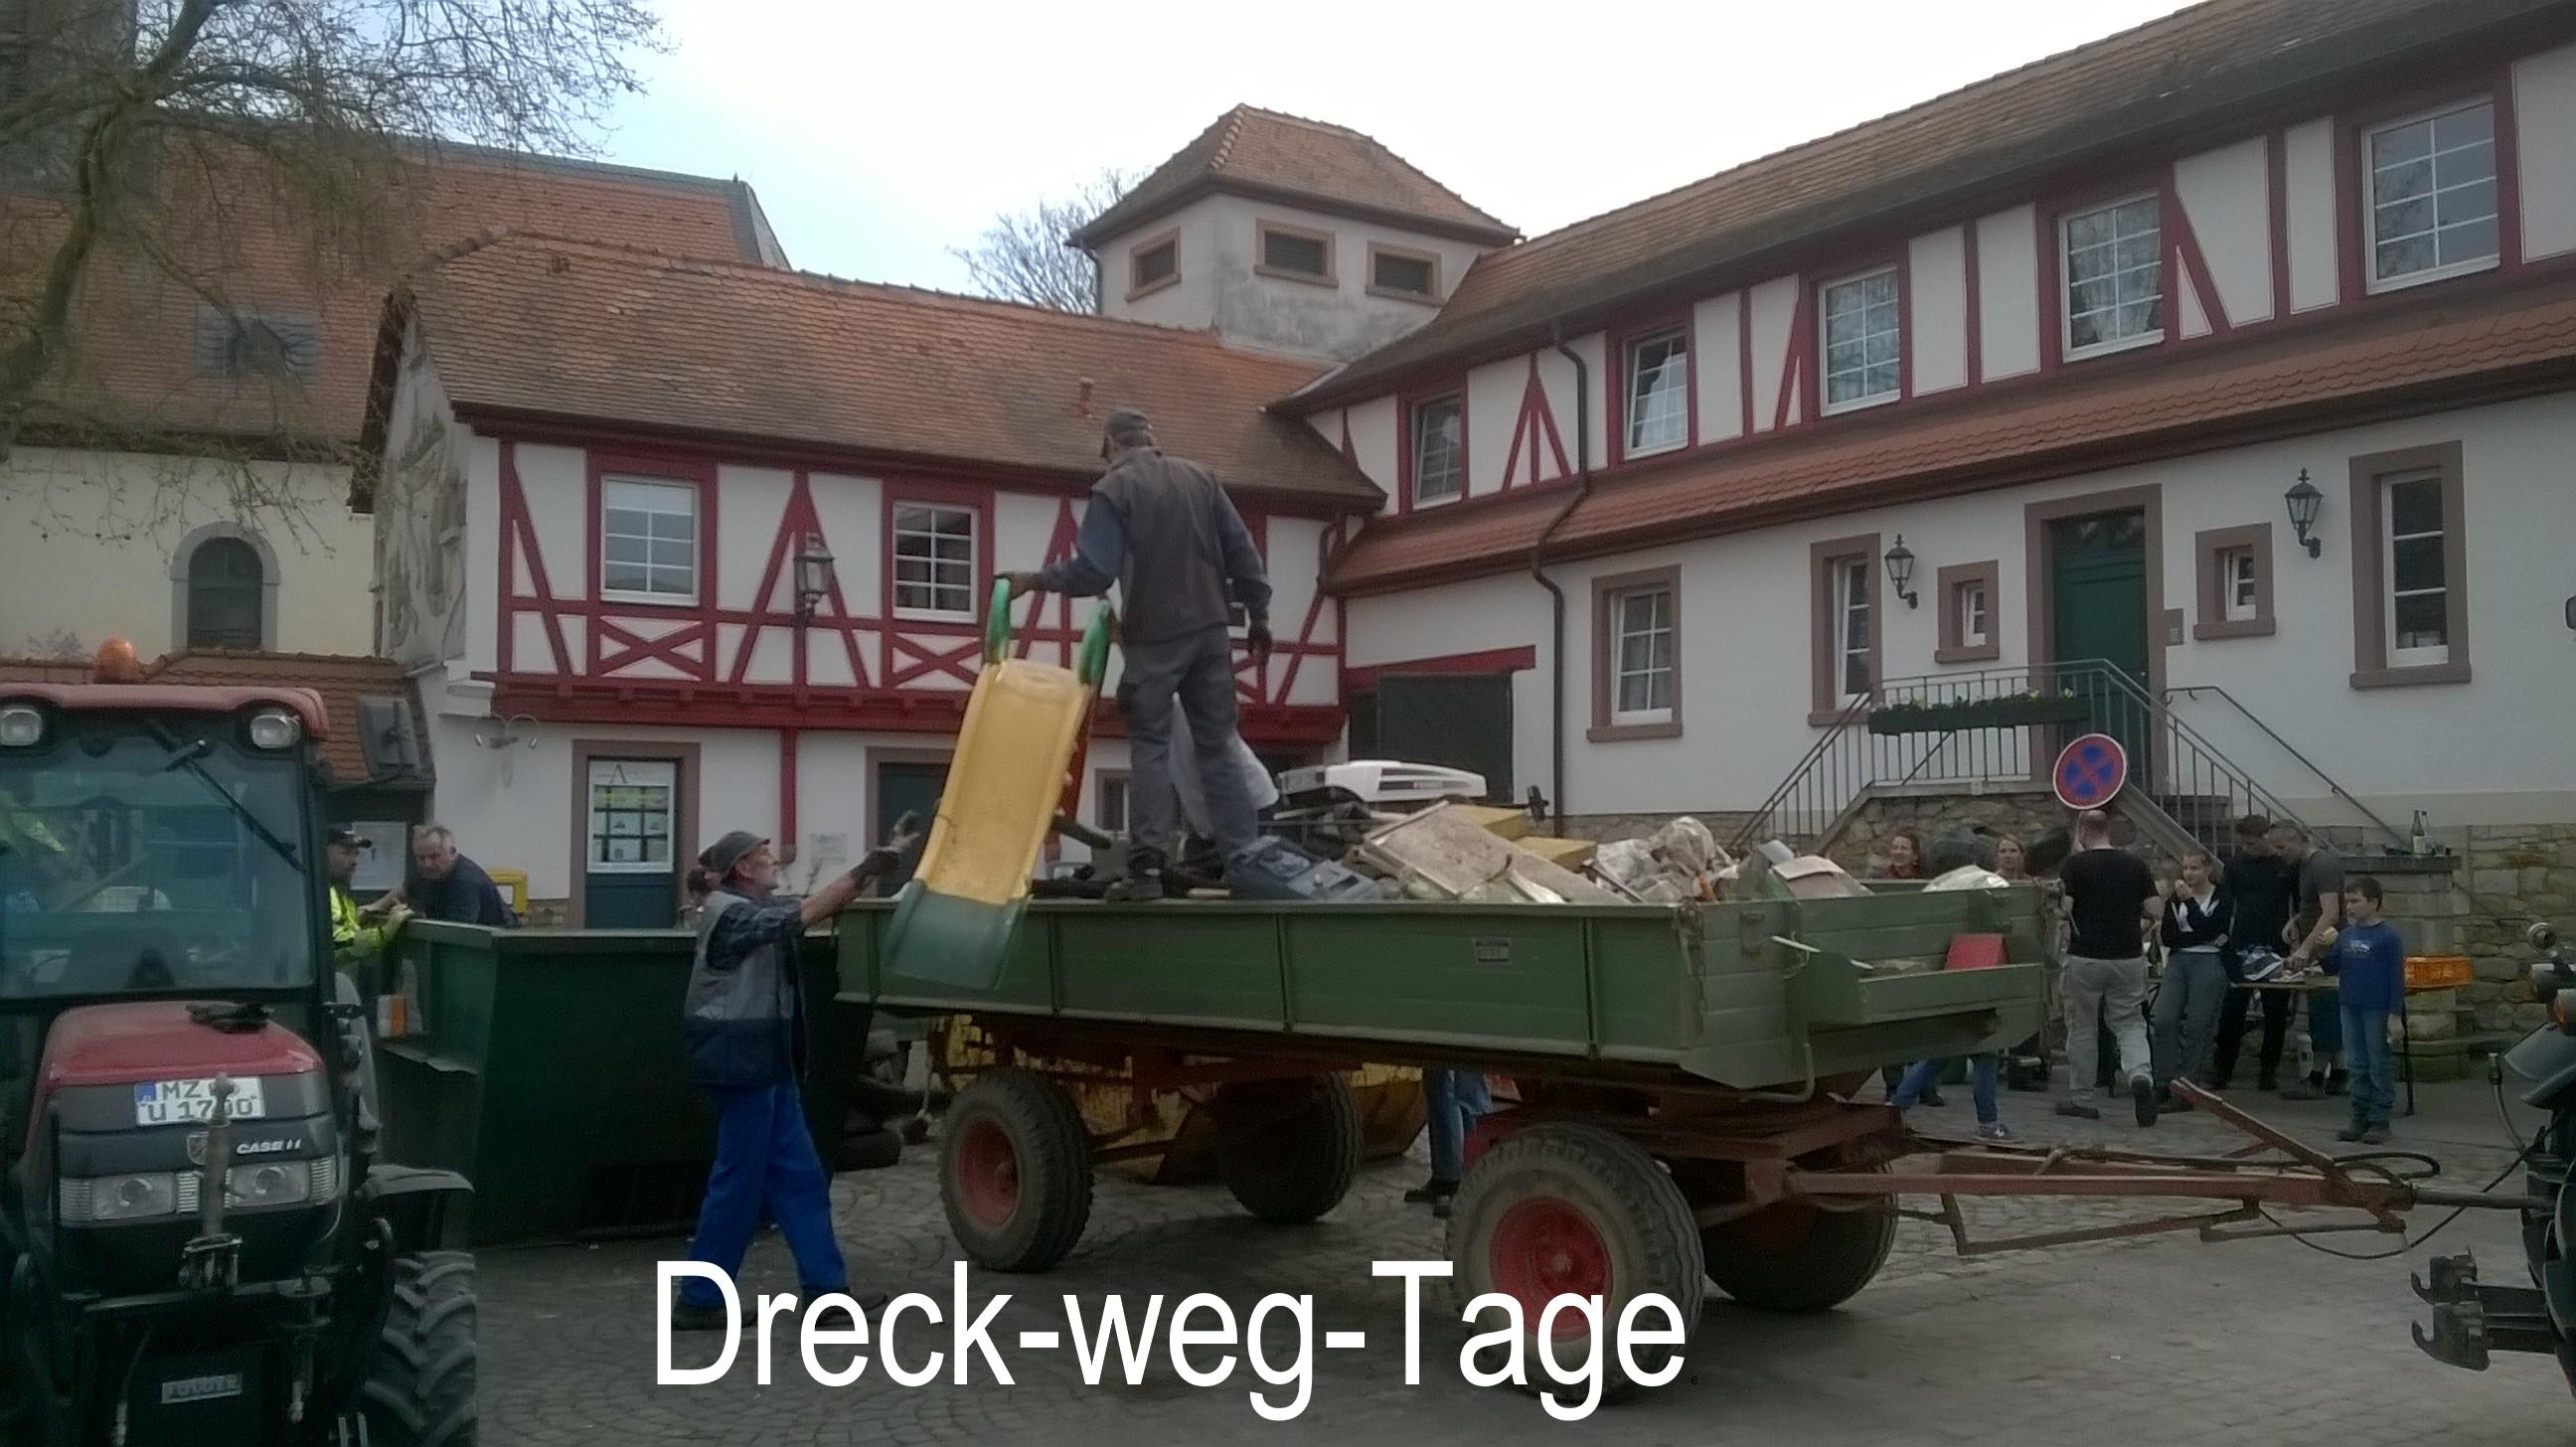 Dreck-weg-Tage